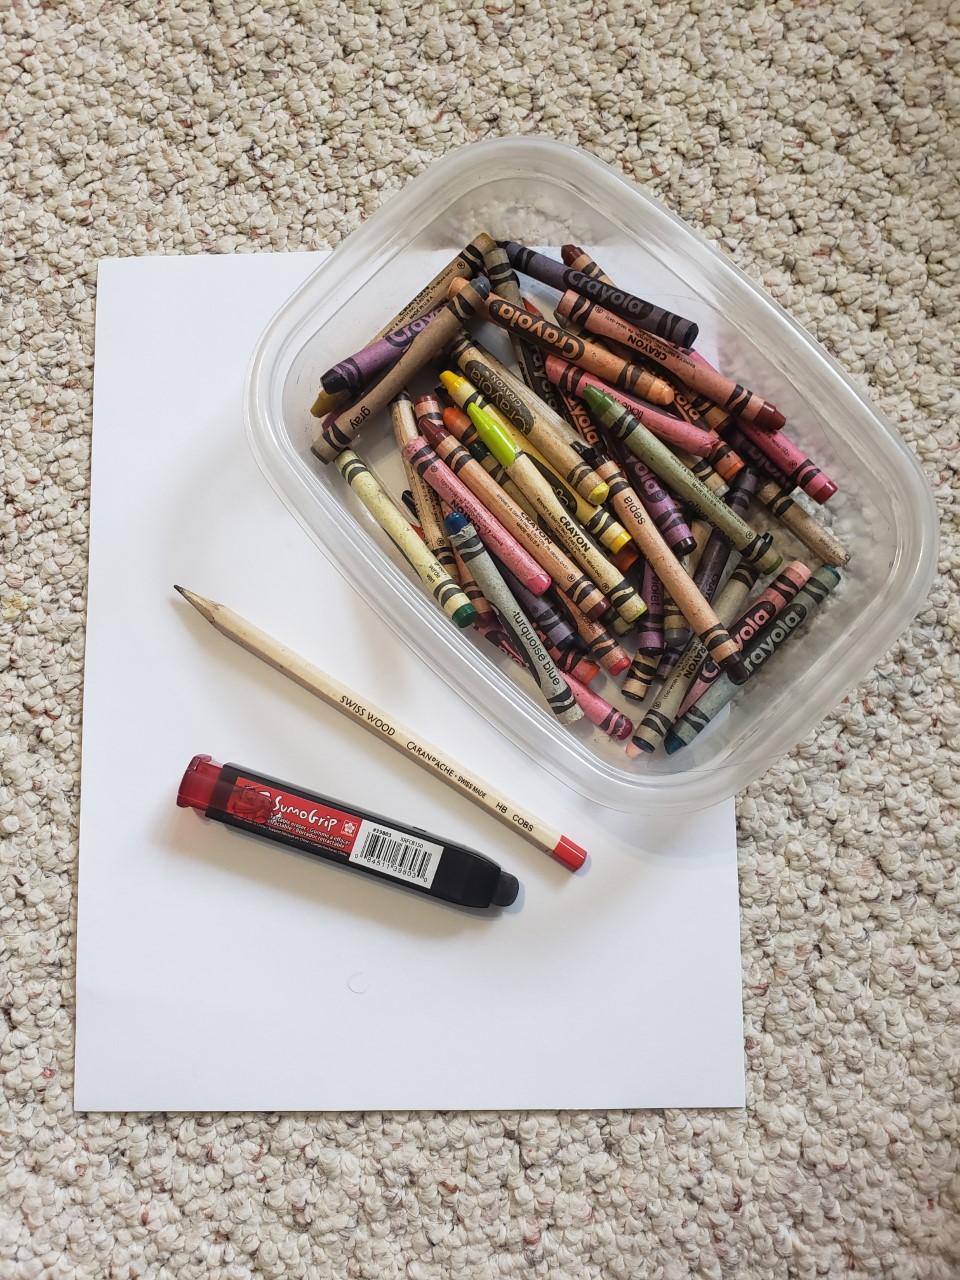 Paper, pencil, eraser